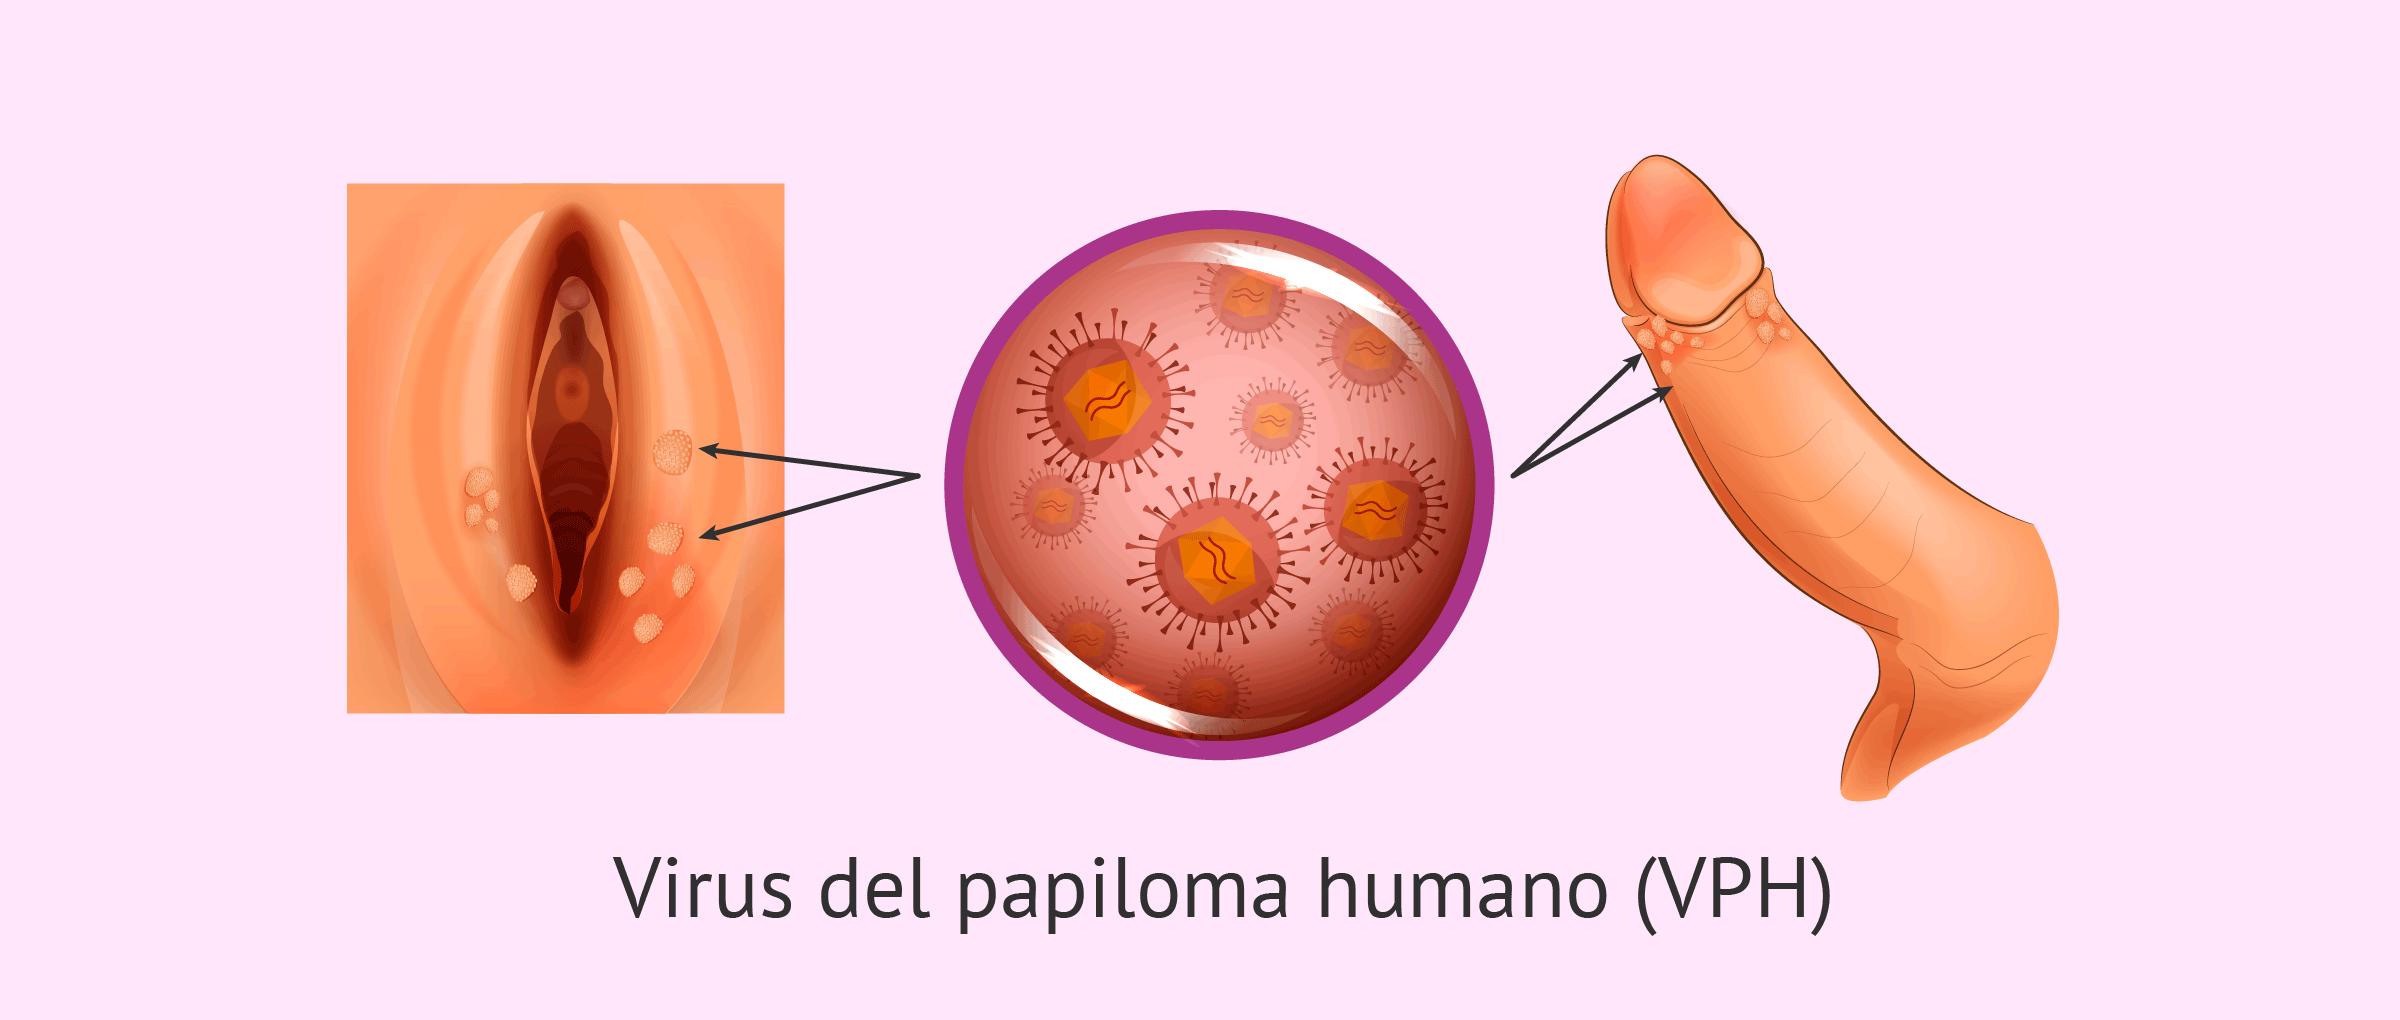 human papillomavirus (hpv) nedir papilloma bladder pathology outlines